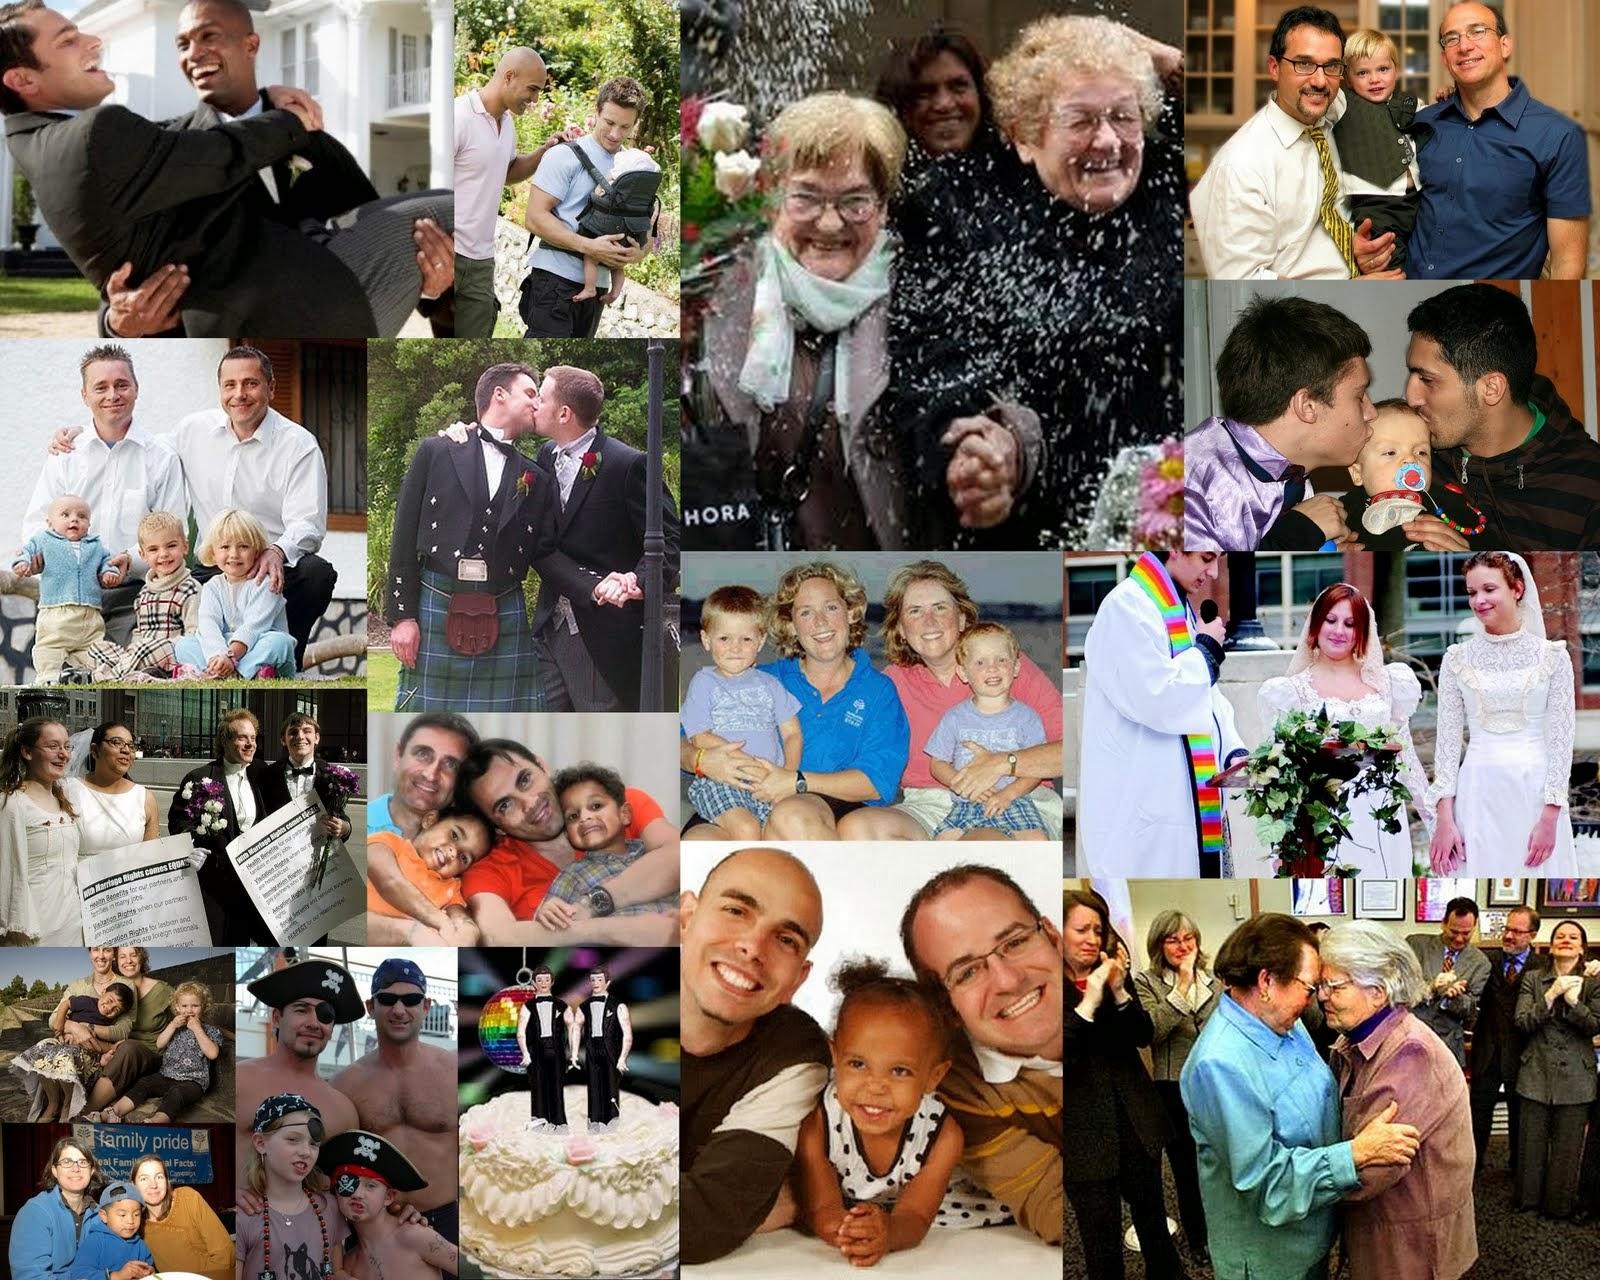 Mujer transgenero heterosexual family